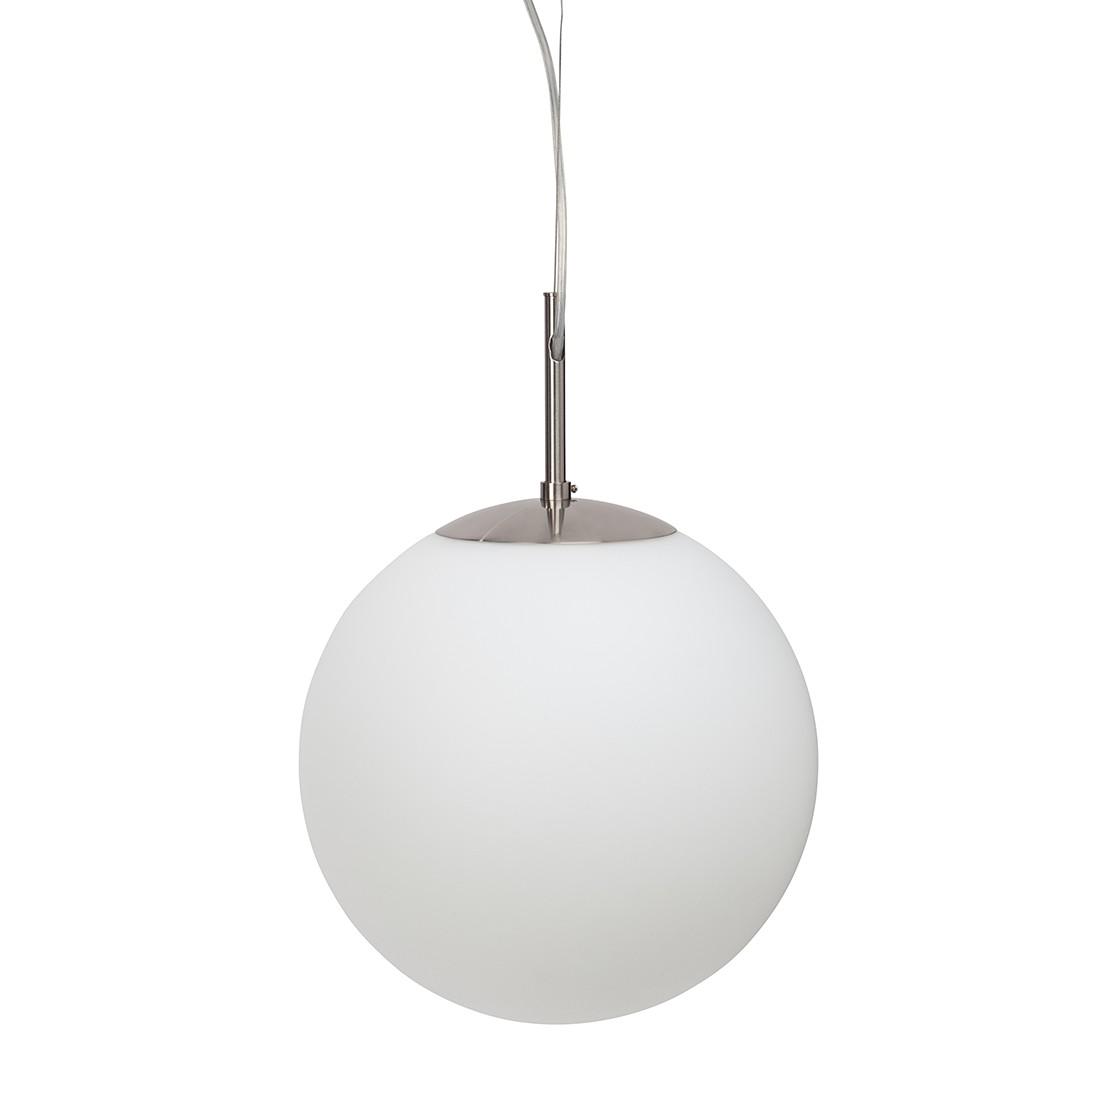 EEK A++, Pendelleuchte Sun - Metall - Weiß - 1-flammig, Brilliant